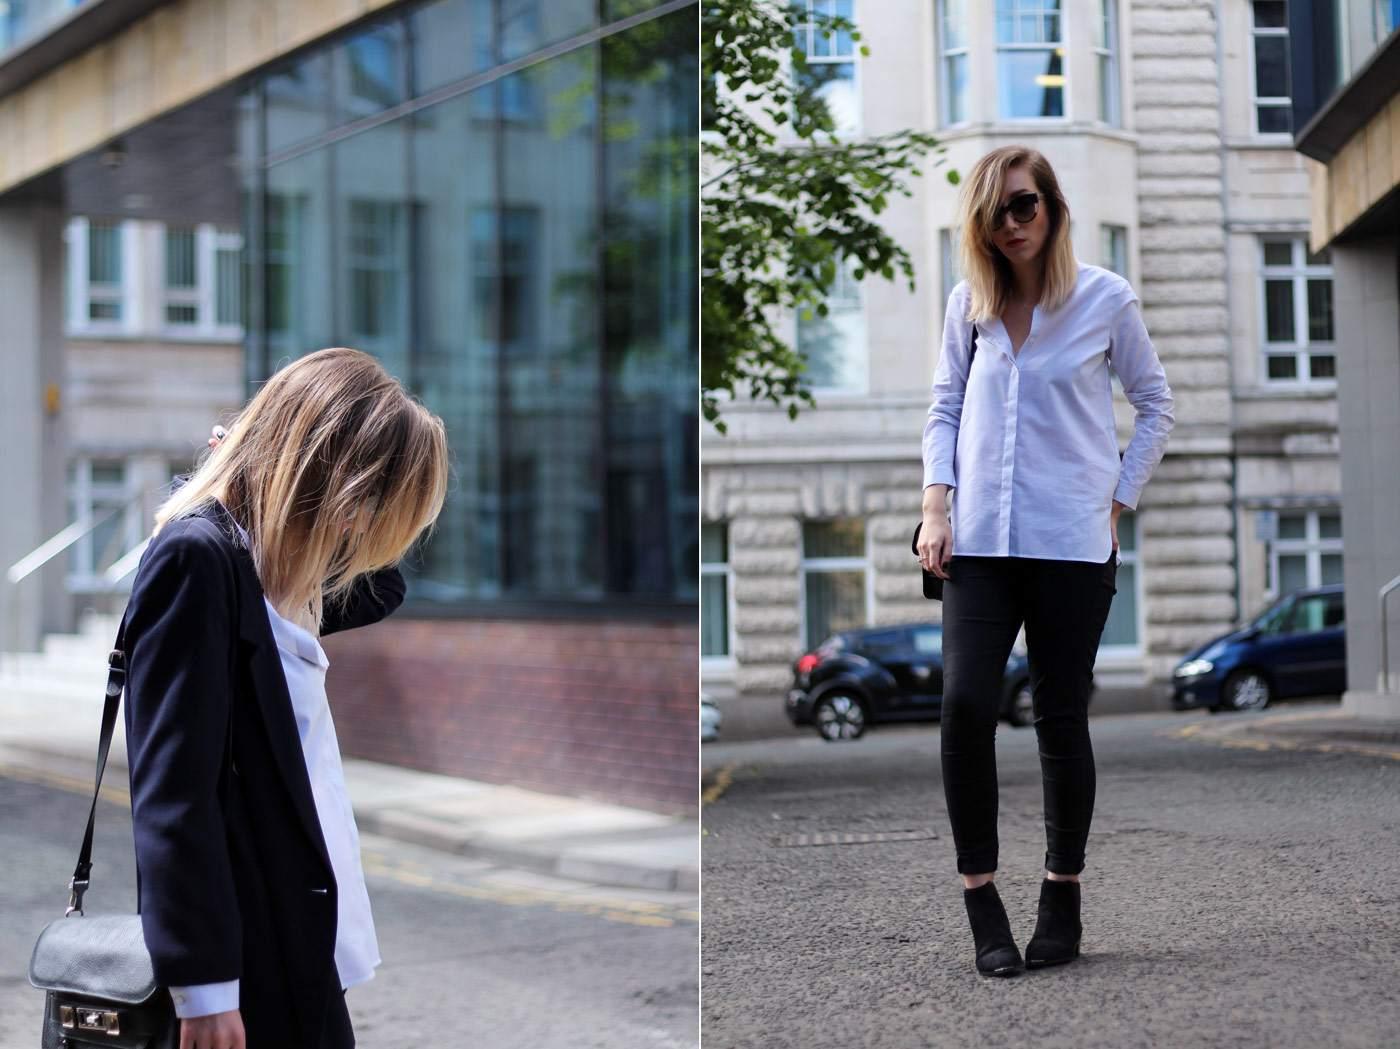 acne-jensen-boots-M&S-alexa-chung-ada-blazer-outfit-17